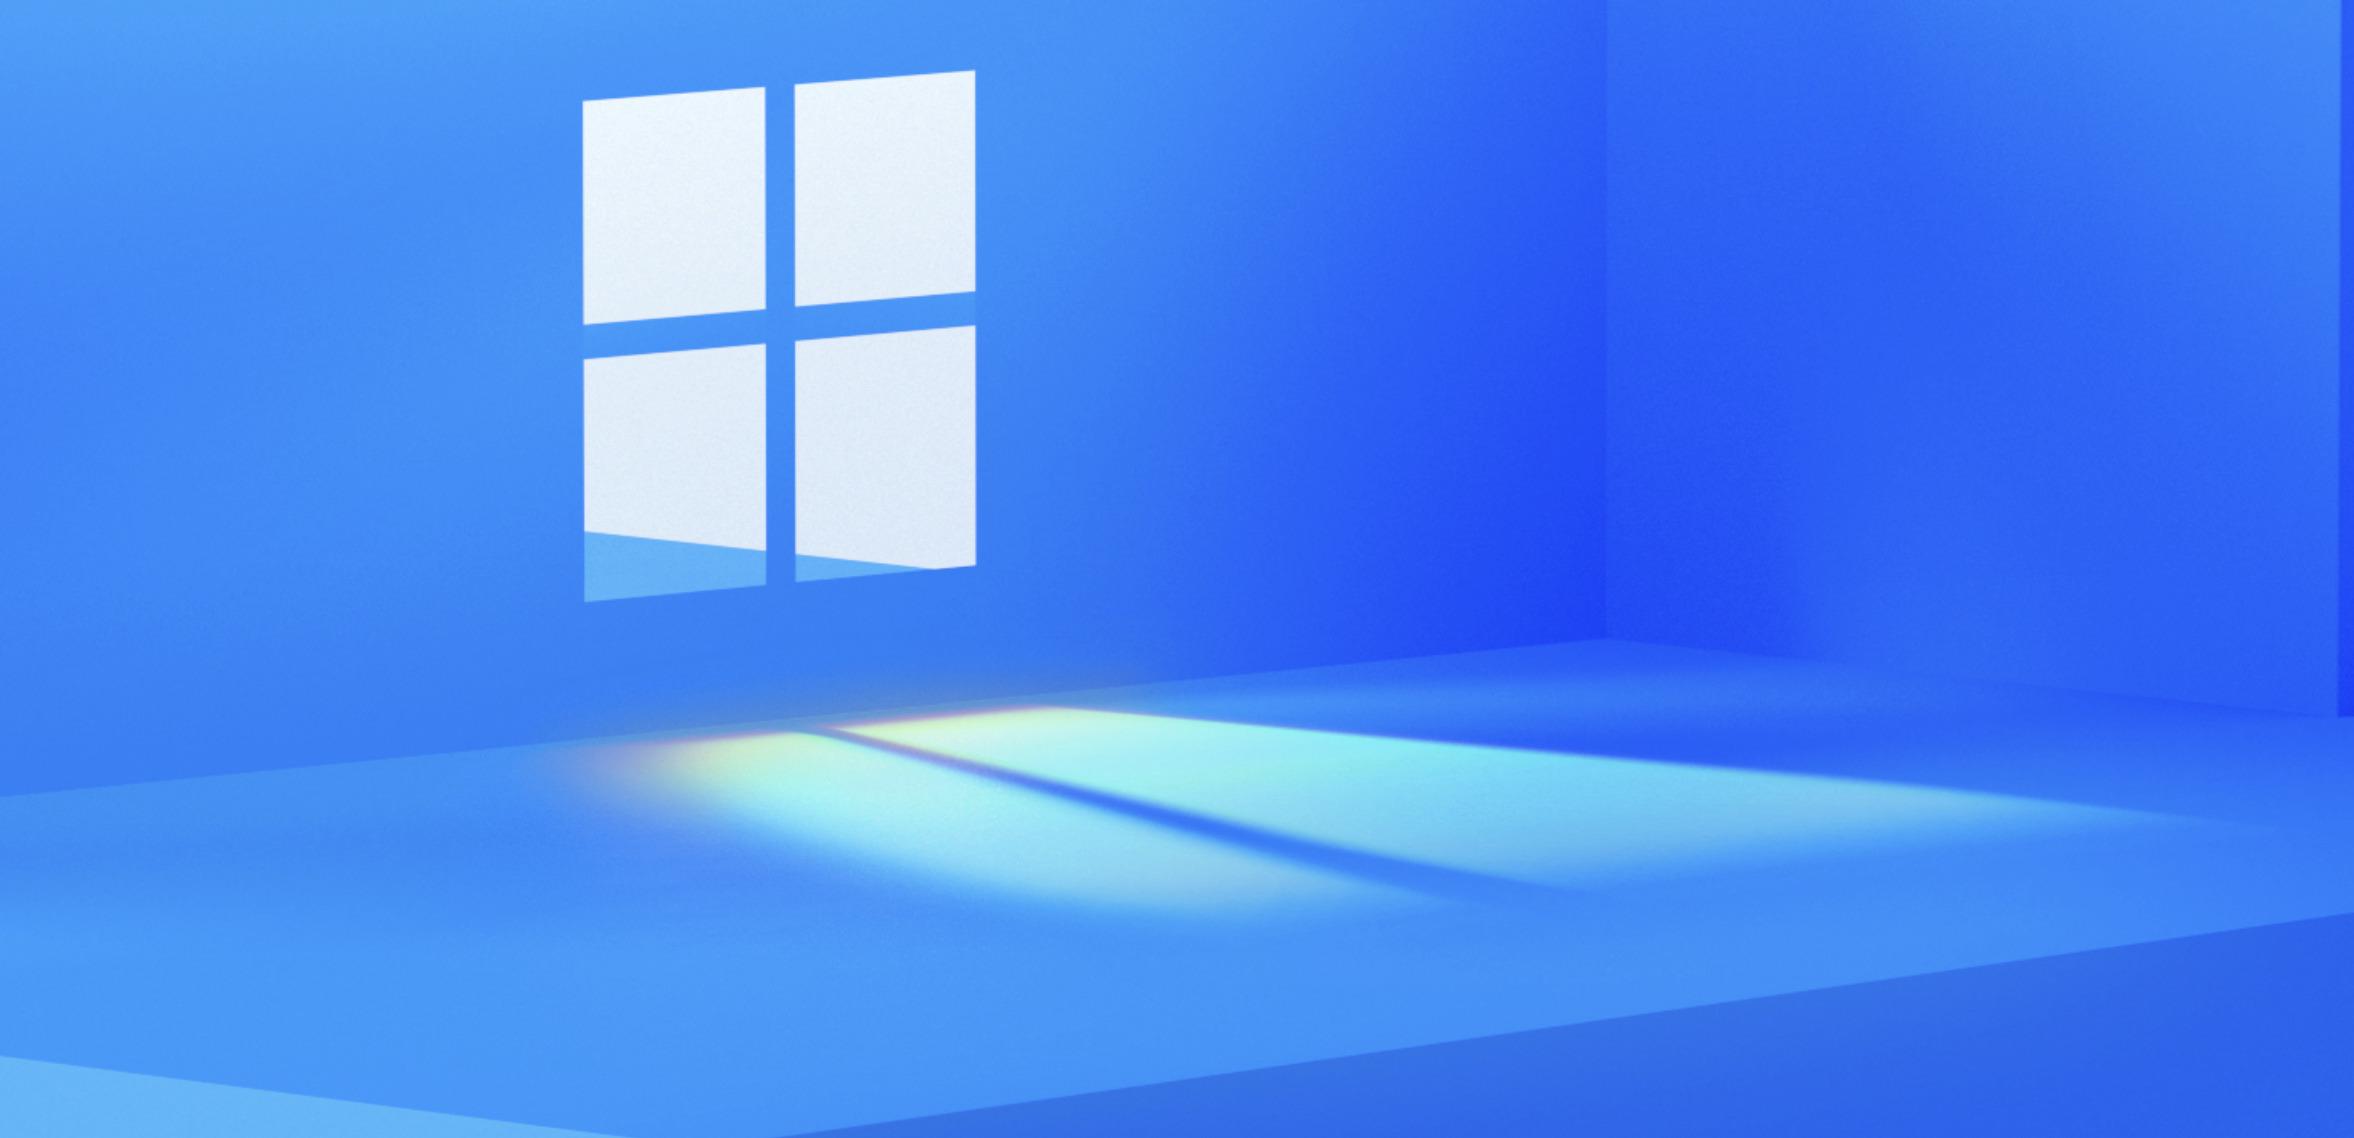 Sun Valley : Microsoft officialisera le nouveau Windows le 24 juin